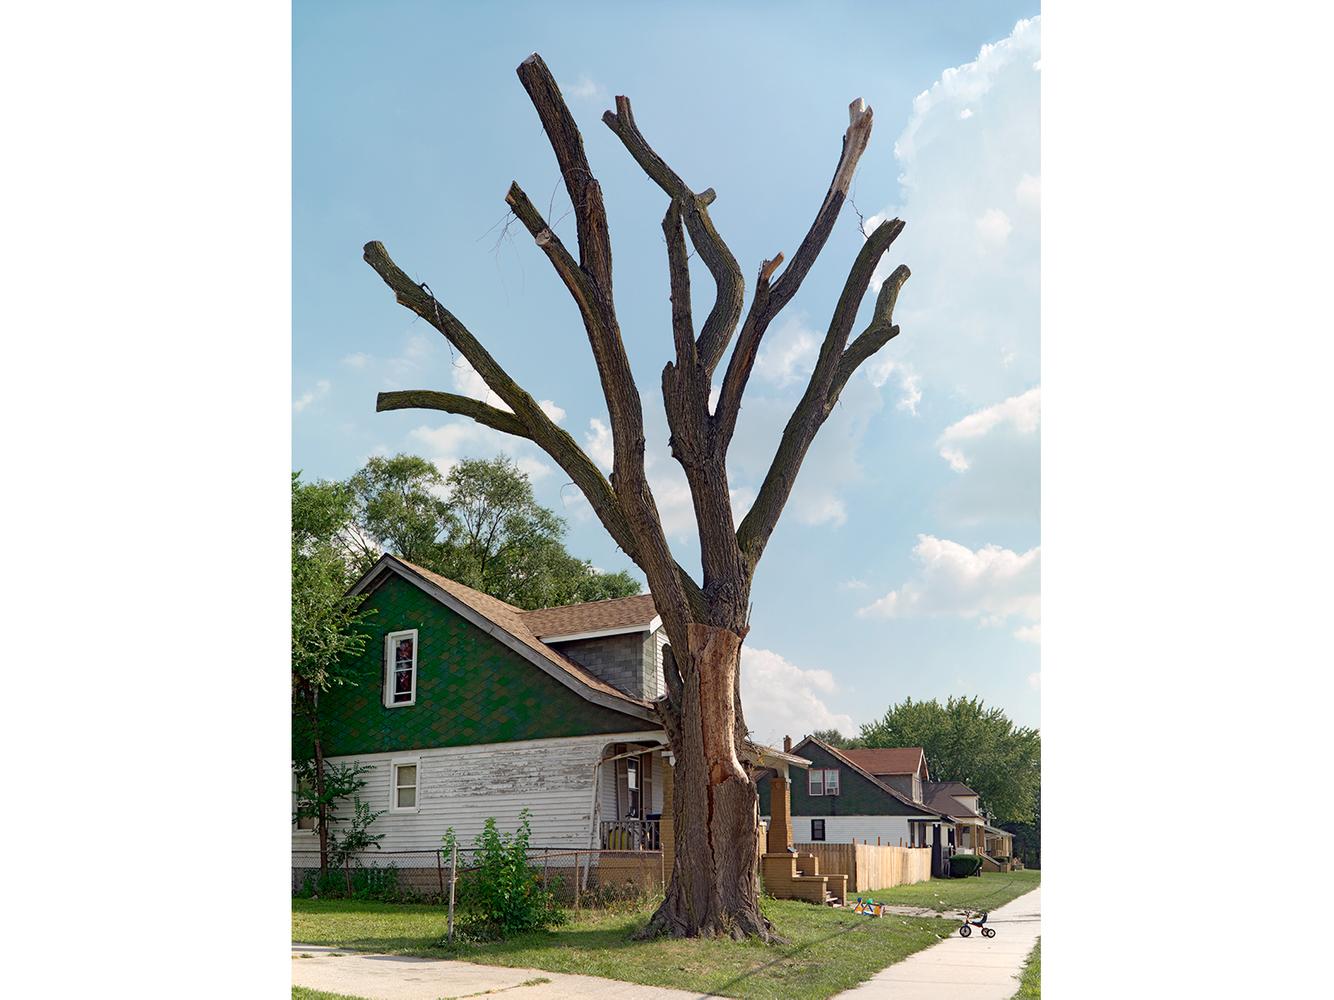 Tree Stump 36, Detroit 2012